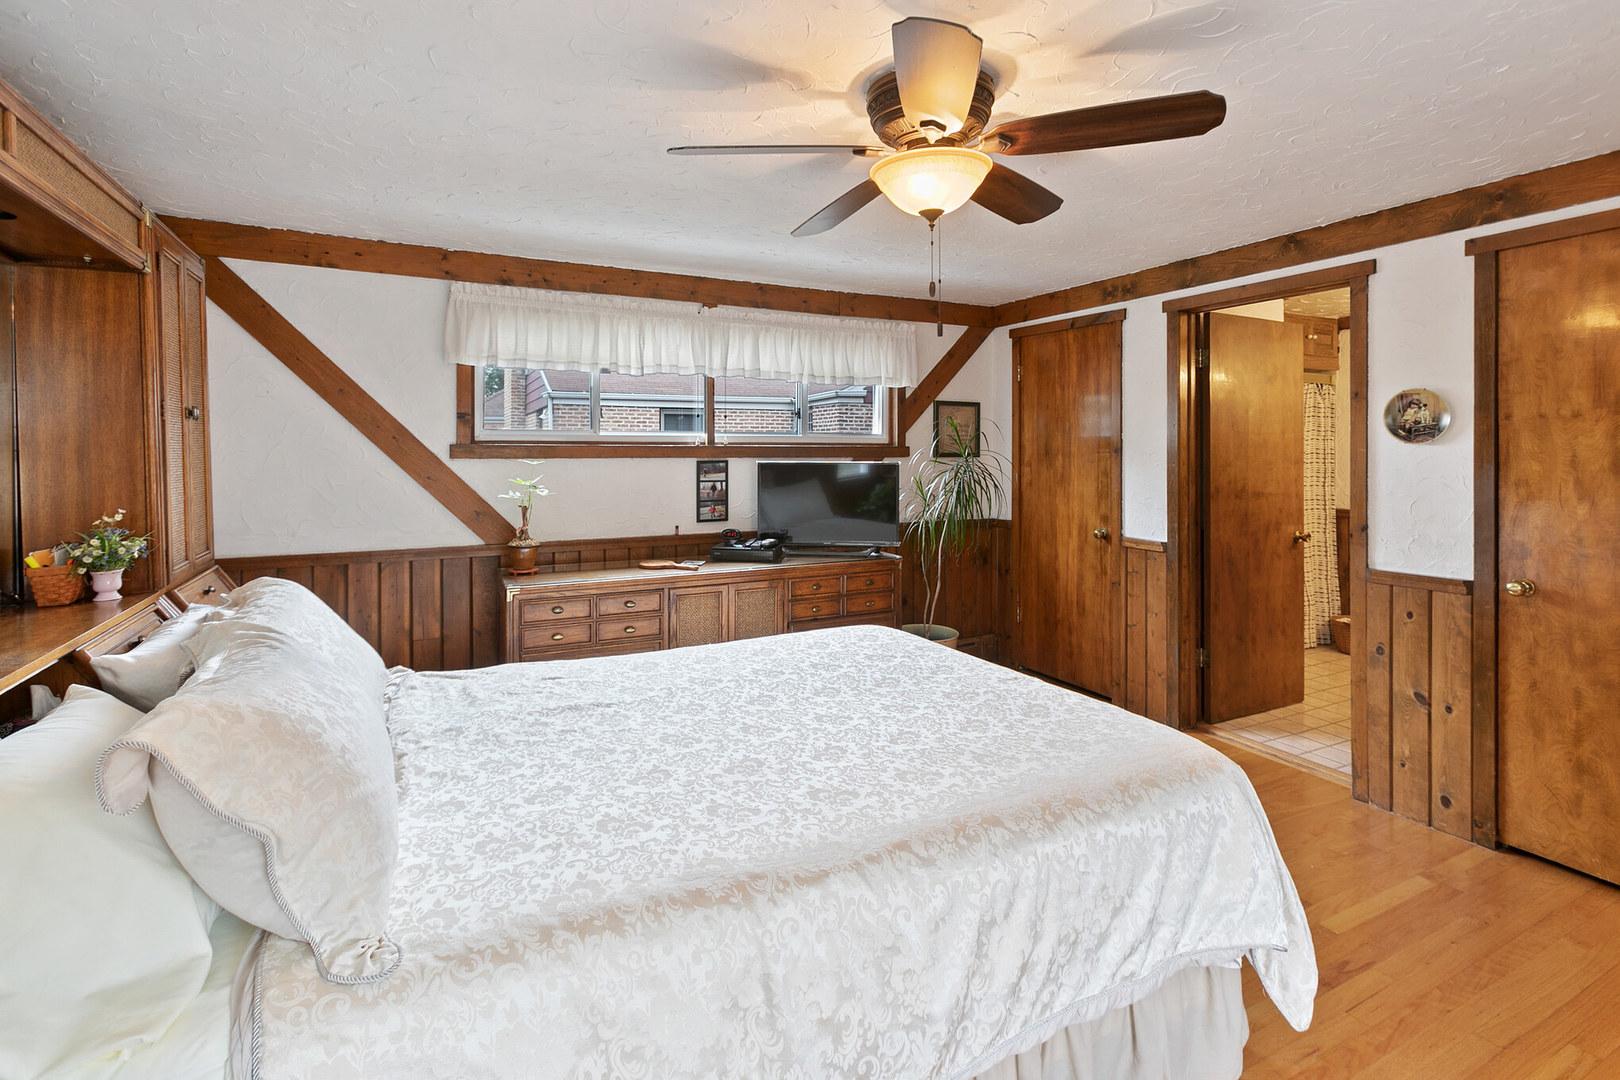 8293 North Merrill, NILES, Illinois, 60714